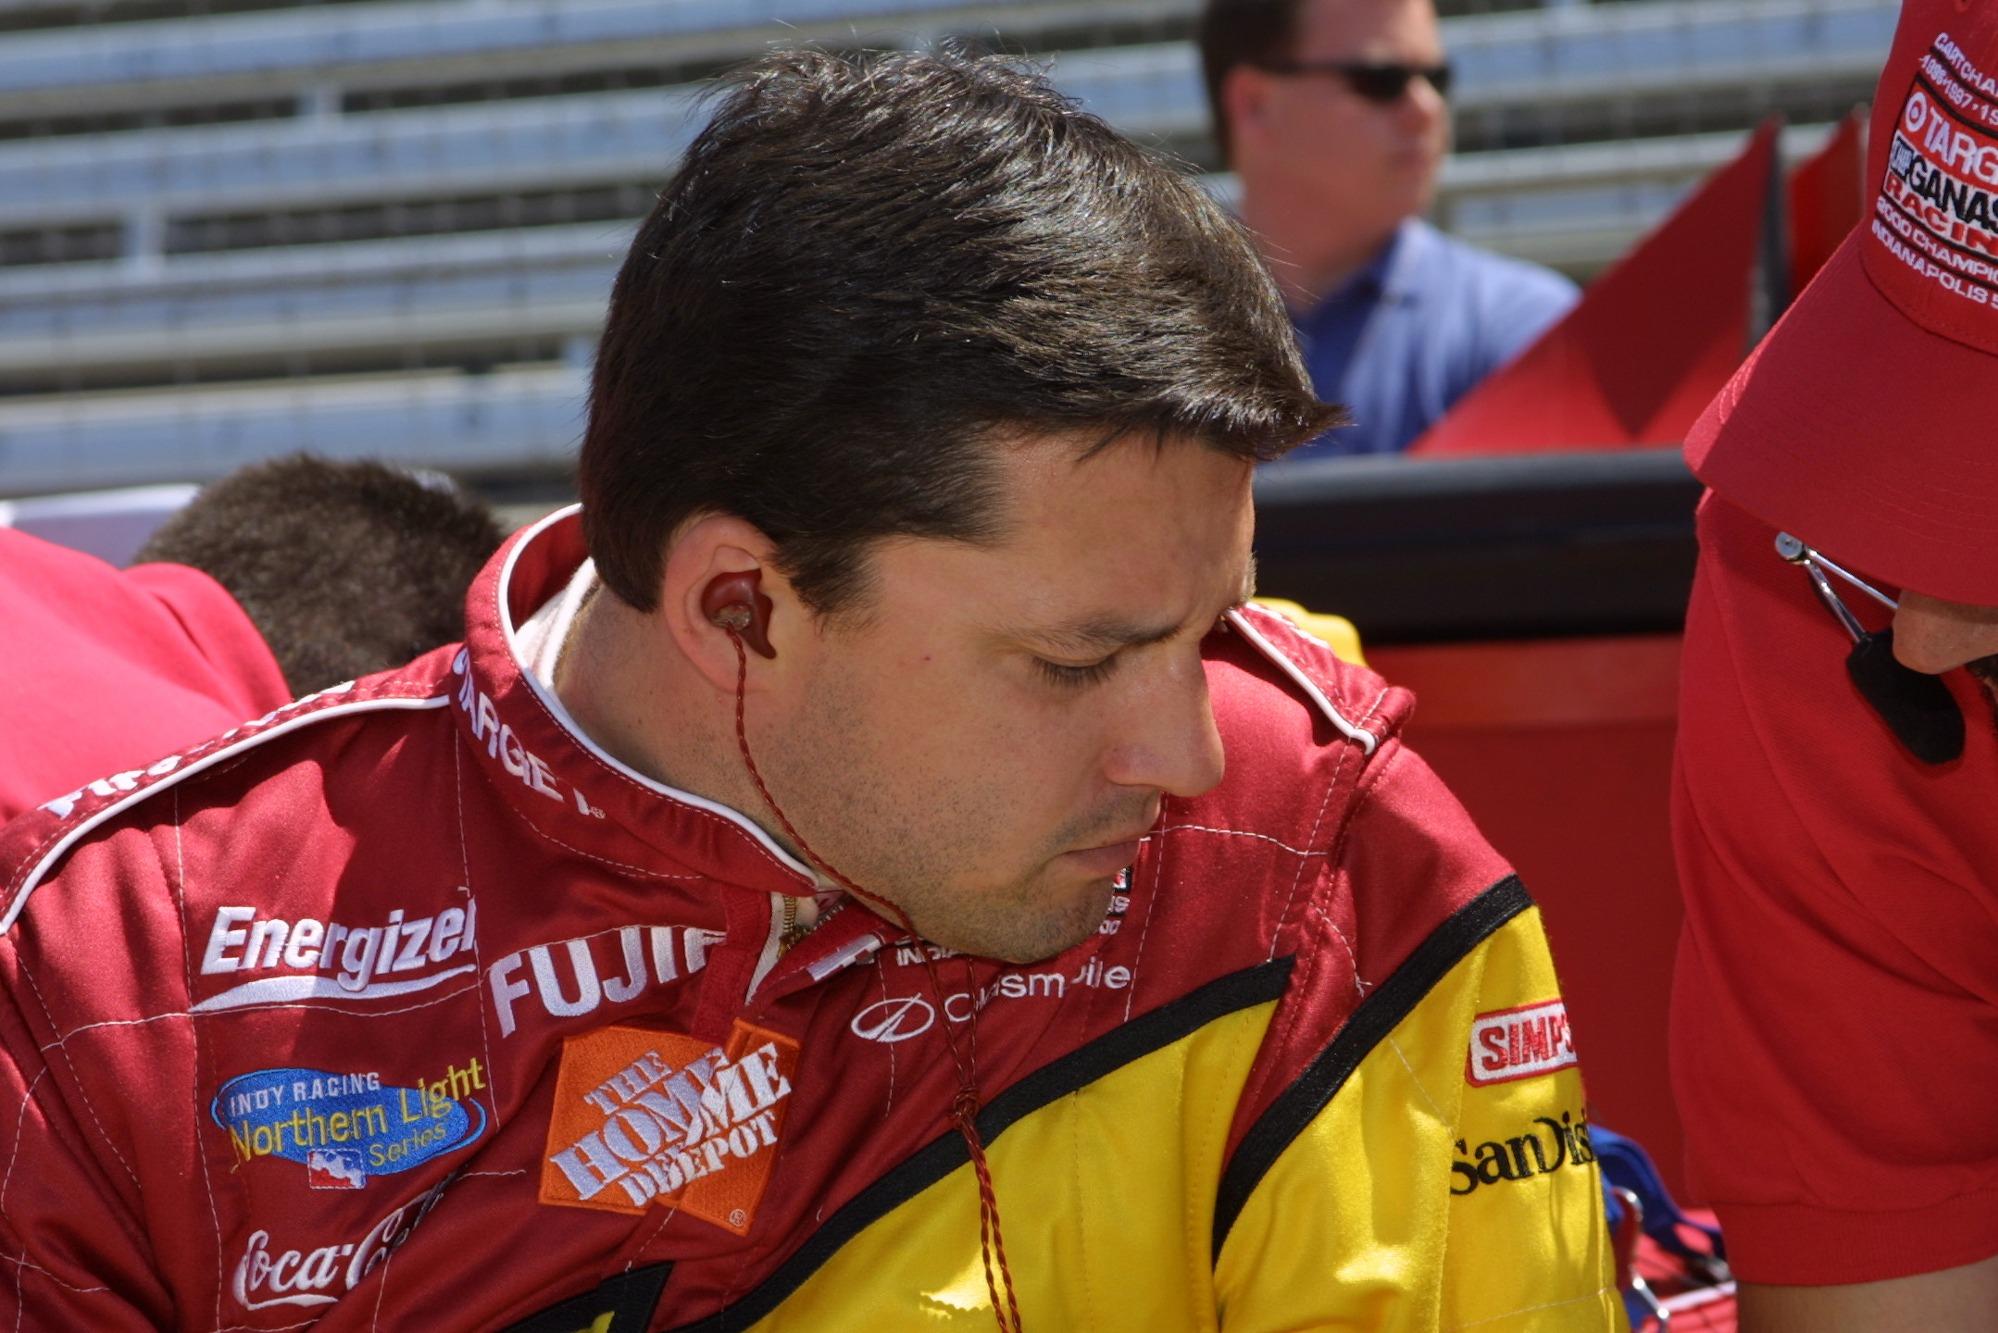 Tony Stewart, 2001 Indy 500